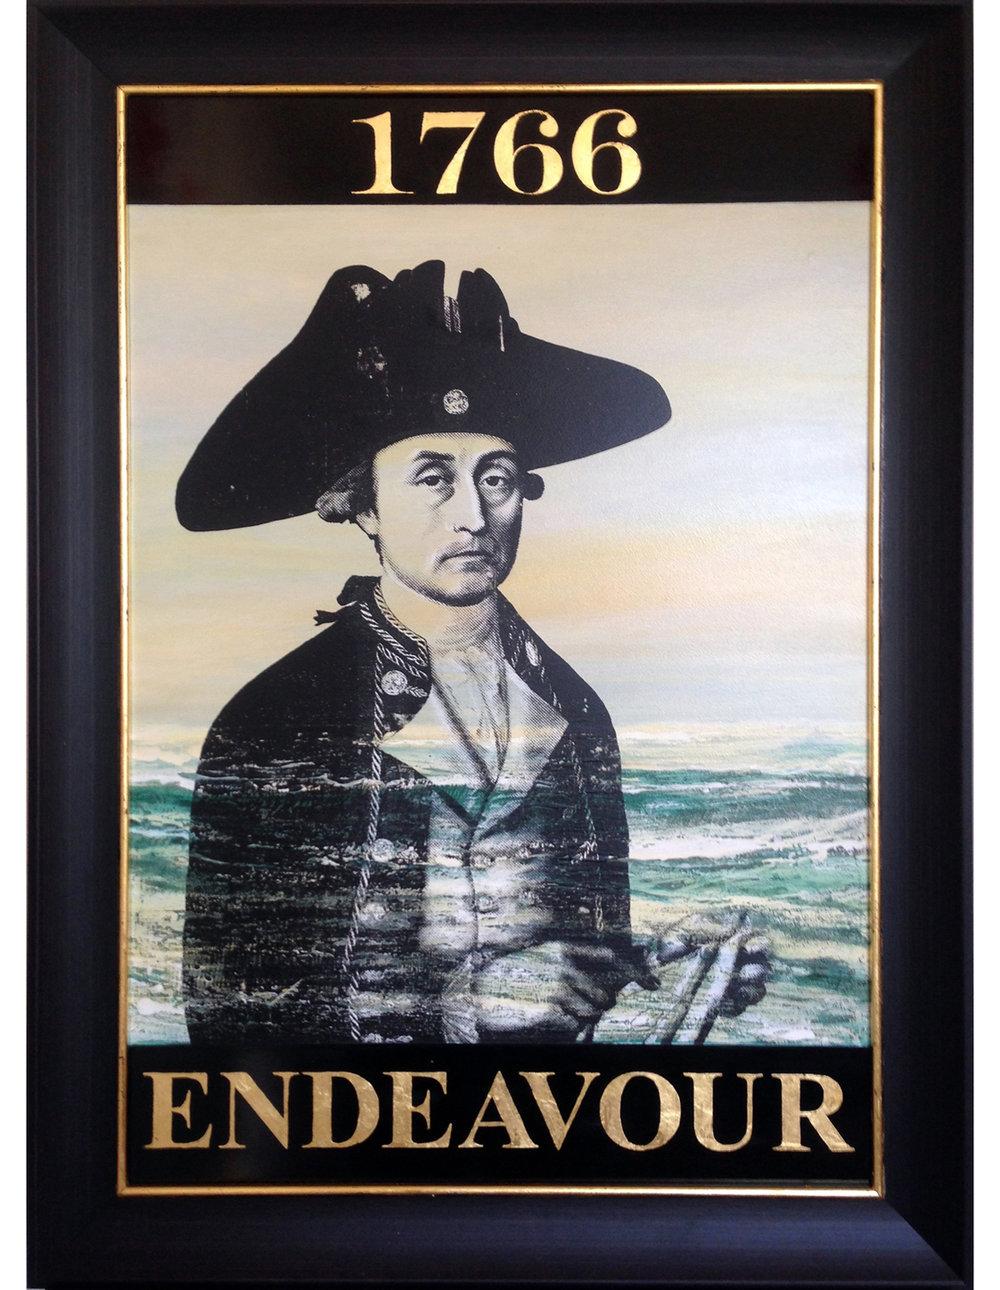 w Endeavour 1766.jpg